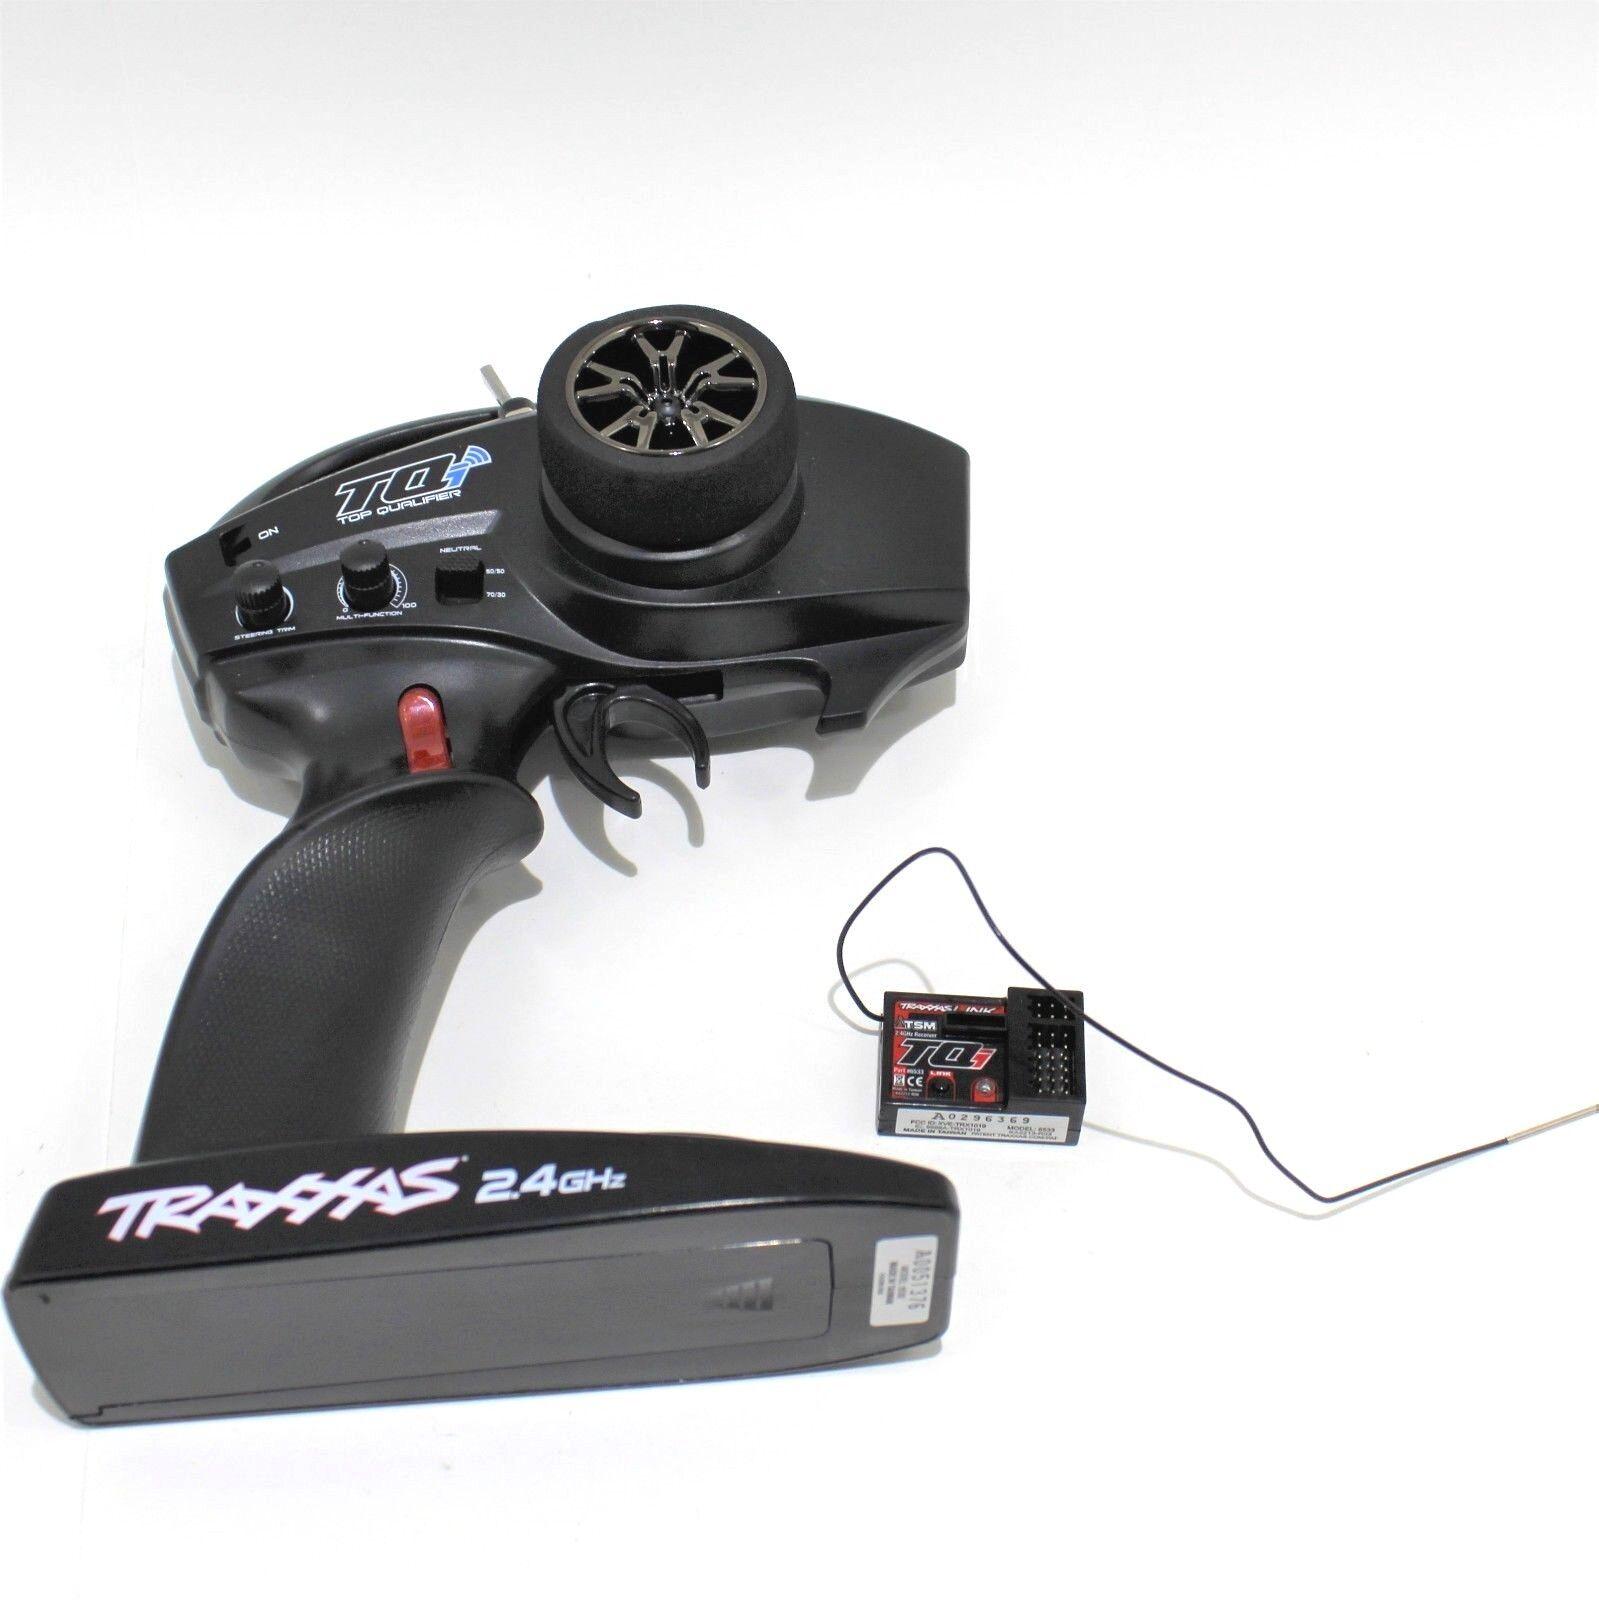 Traxxas Tqi Trx TRX4 azultooth 2.4ghz 4 Canales Transmisor Receptor defender 5